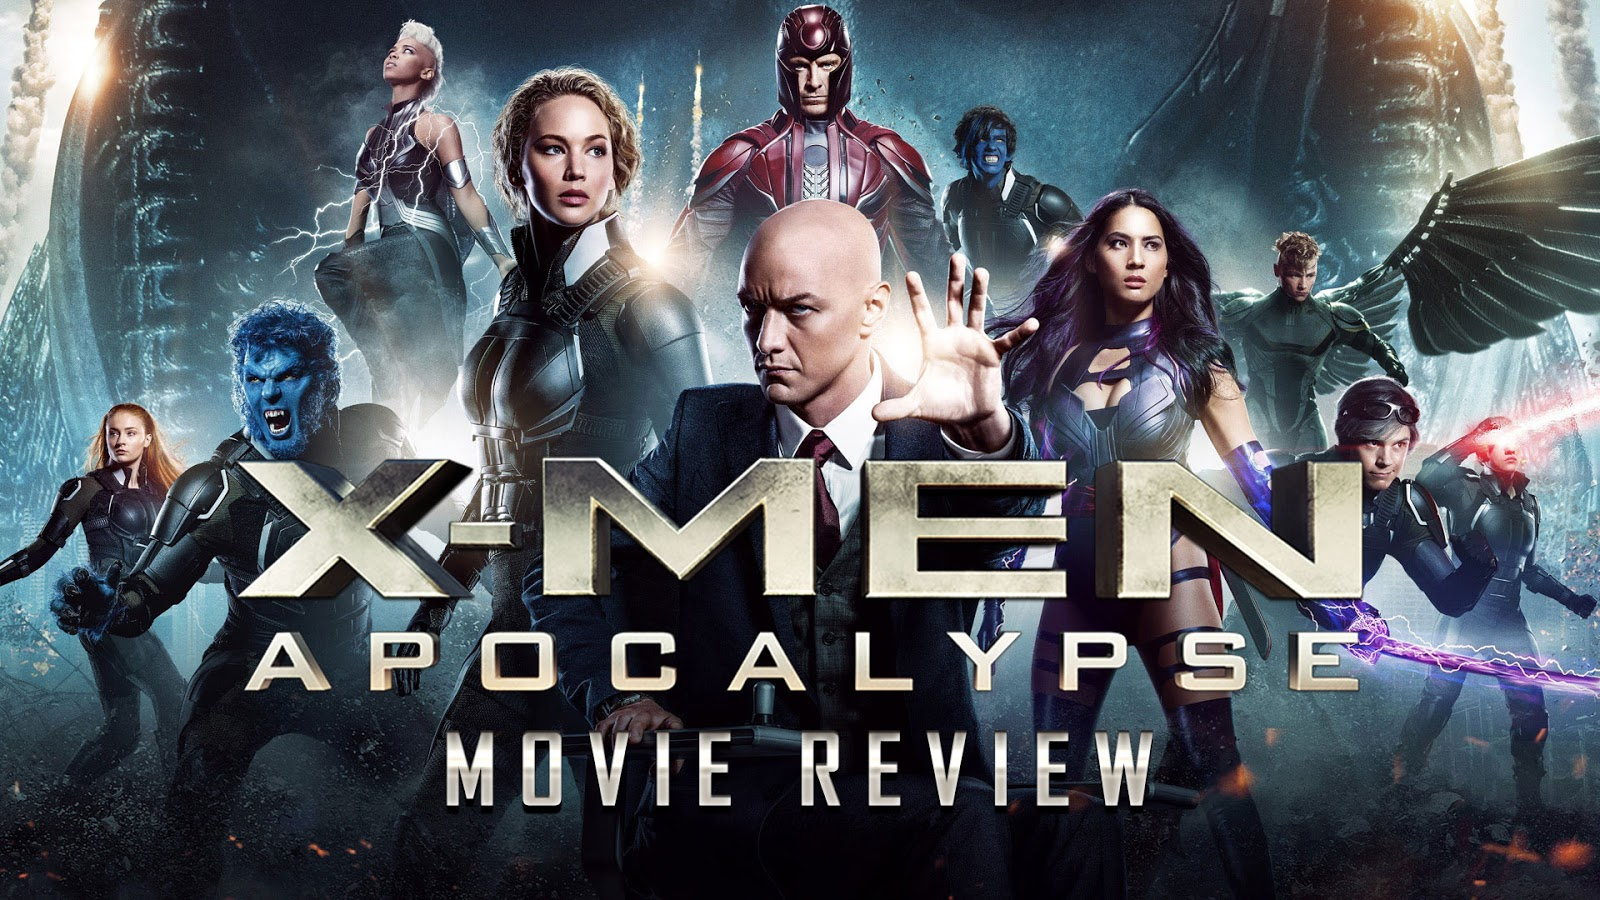 movie review X-Men: Apocalypse podcast